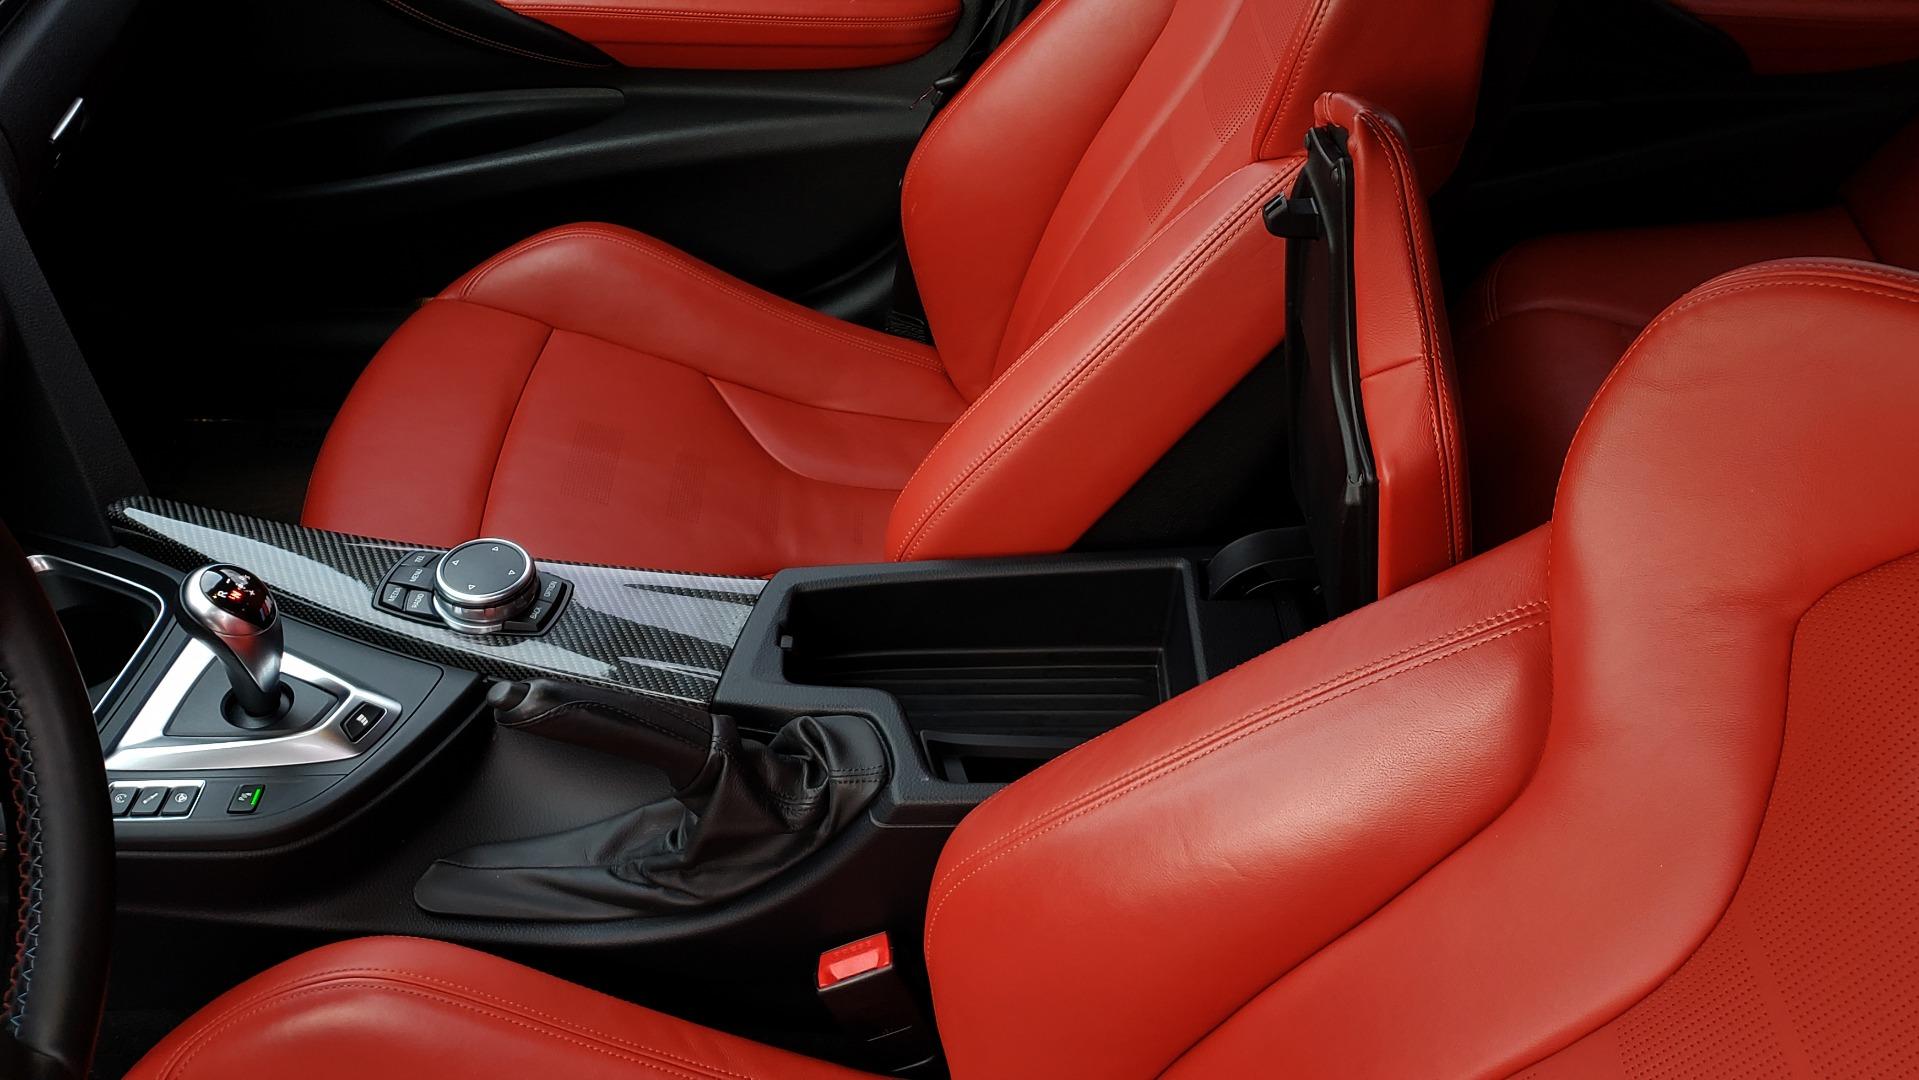 Used 2015 BMW M3 EXECUTIVE PKG / NAV / CAMERA / HUD / CARBON FIBER ROOF for sale Sold at Formula Imports in Charlotte NC 28227 69